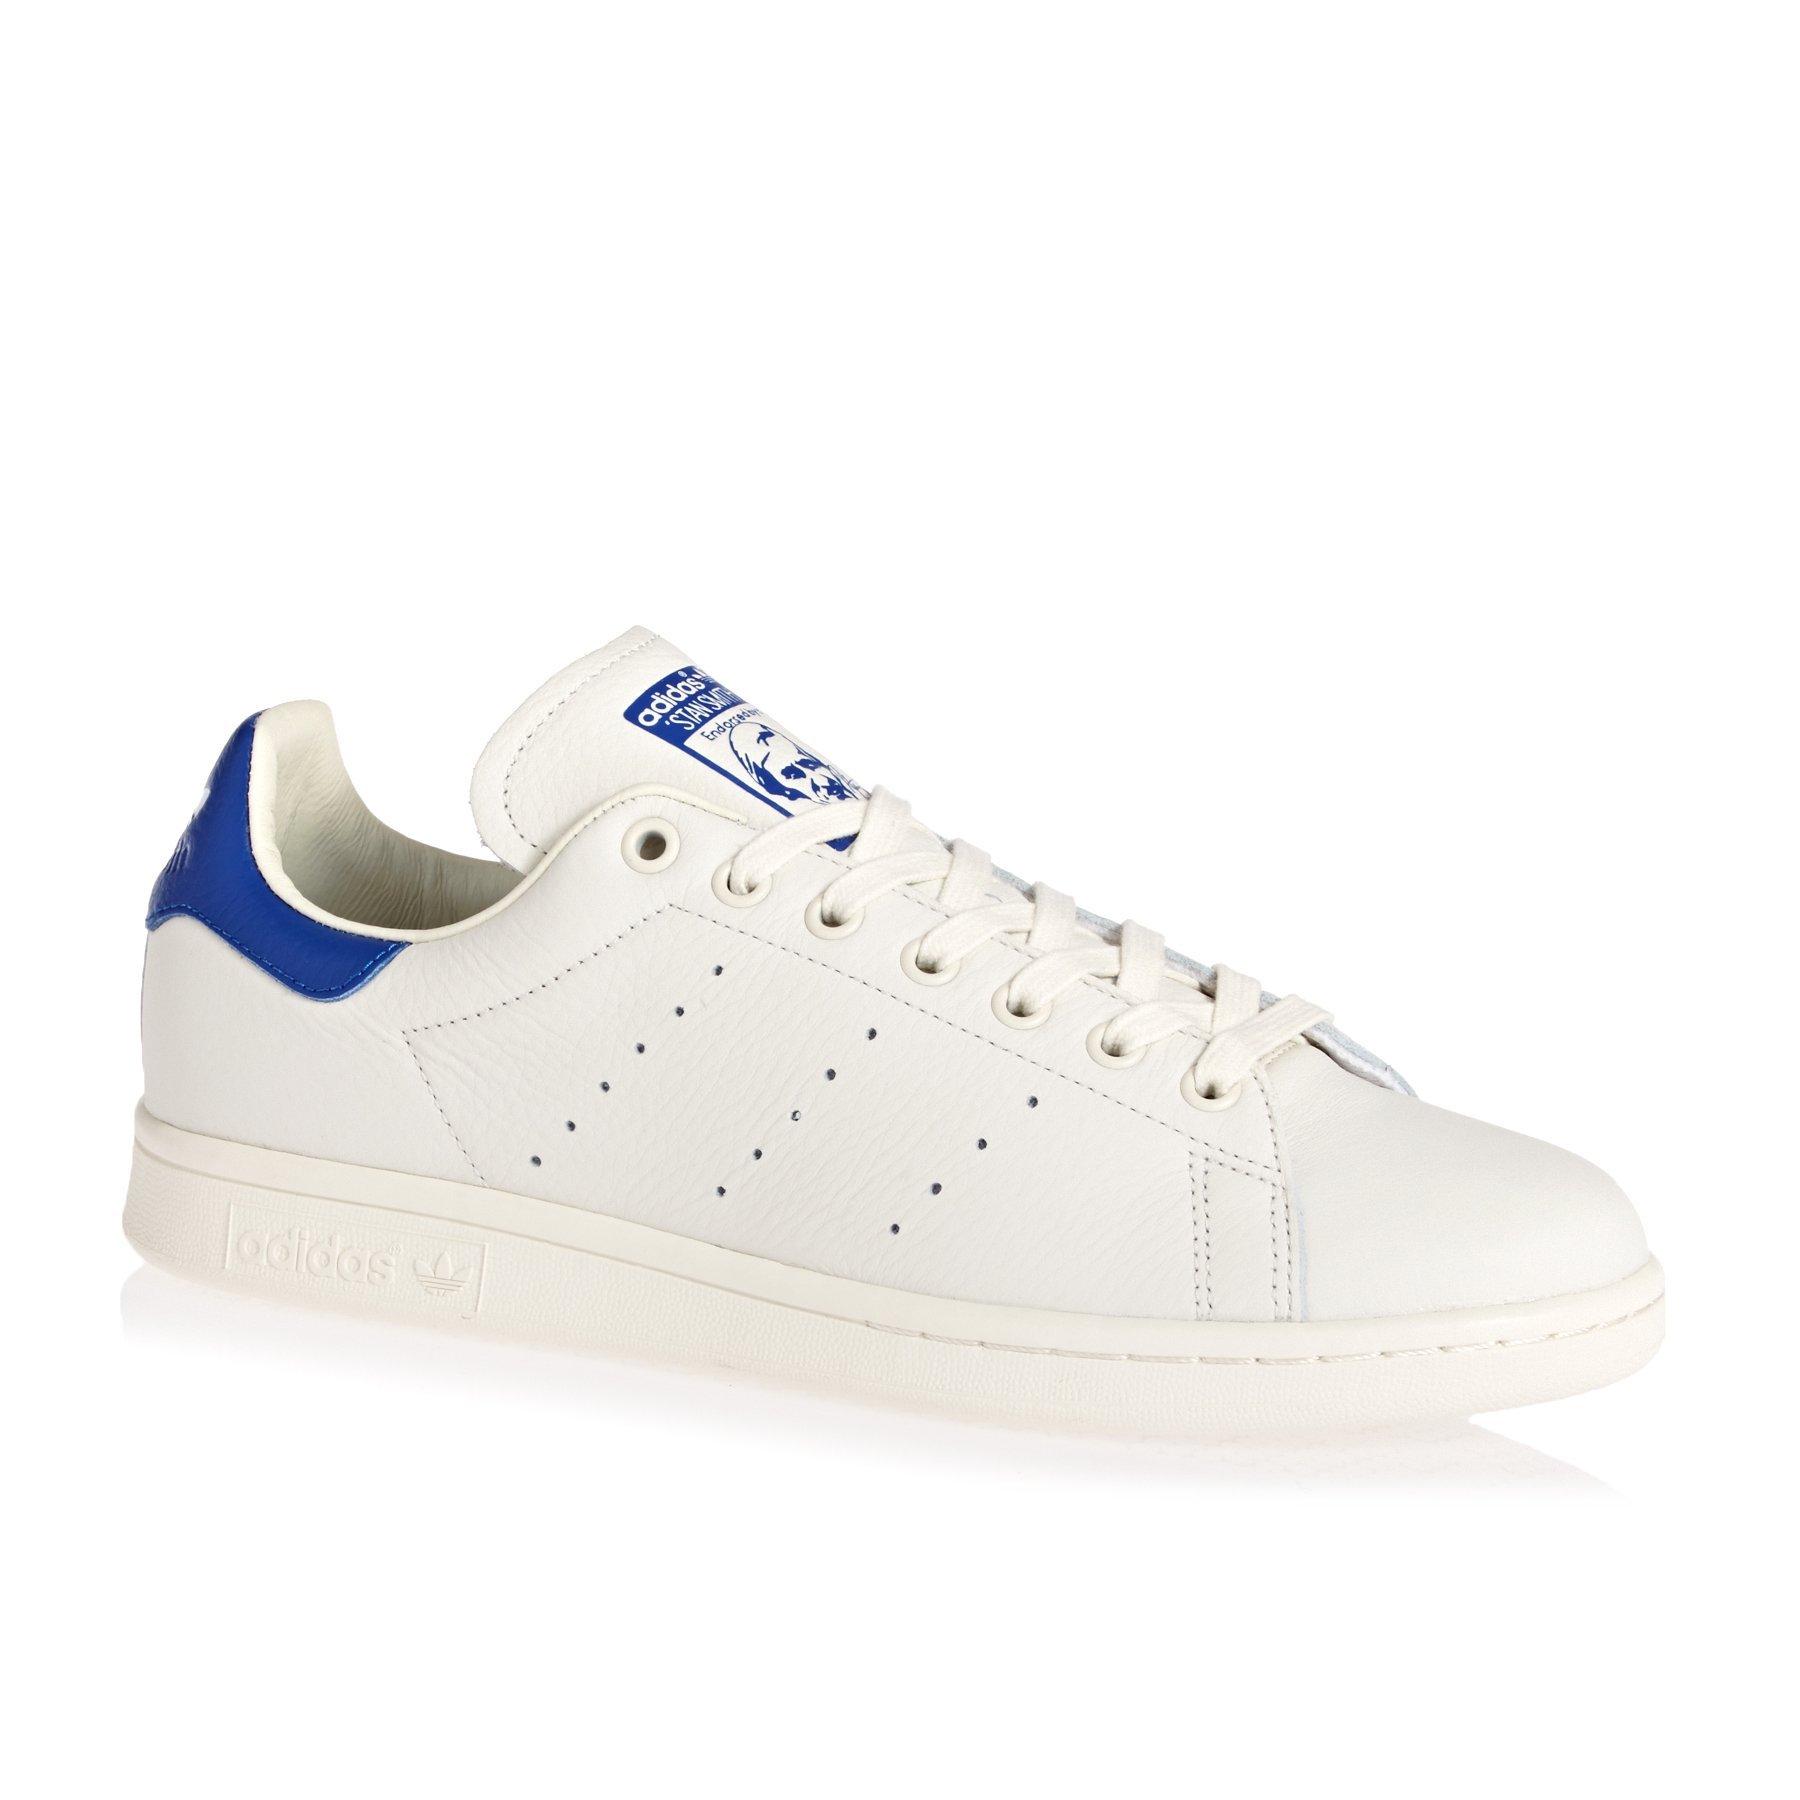 fef6e19634 adidas Originals Stan Smith Shoes 11.5 B(M) US Women / 10.5 D(M) US  Cwhite/cwhite/Croyal